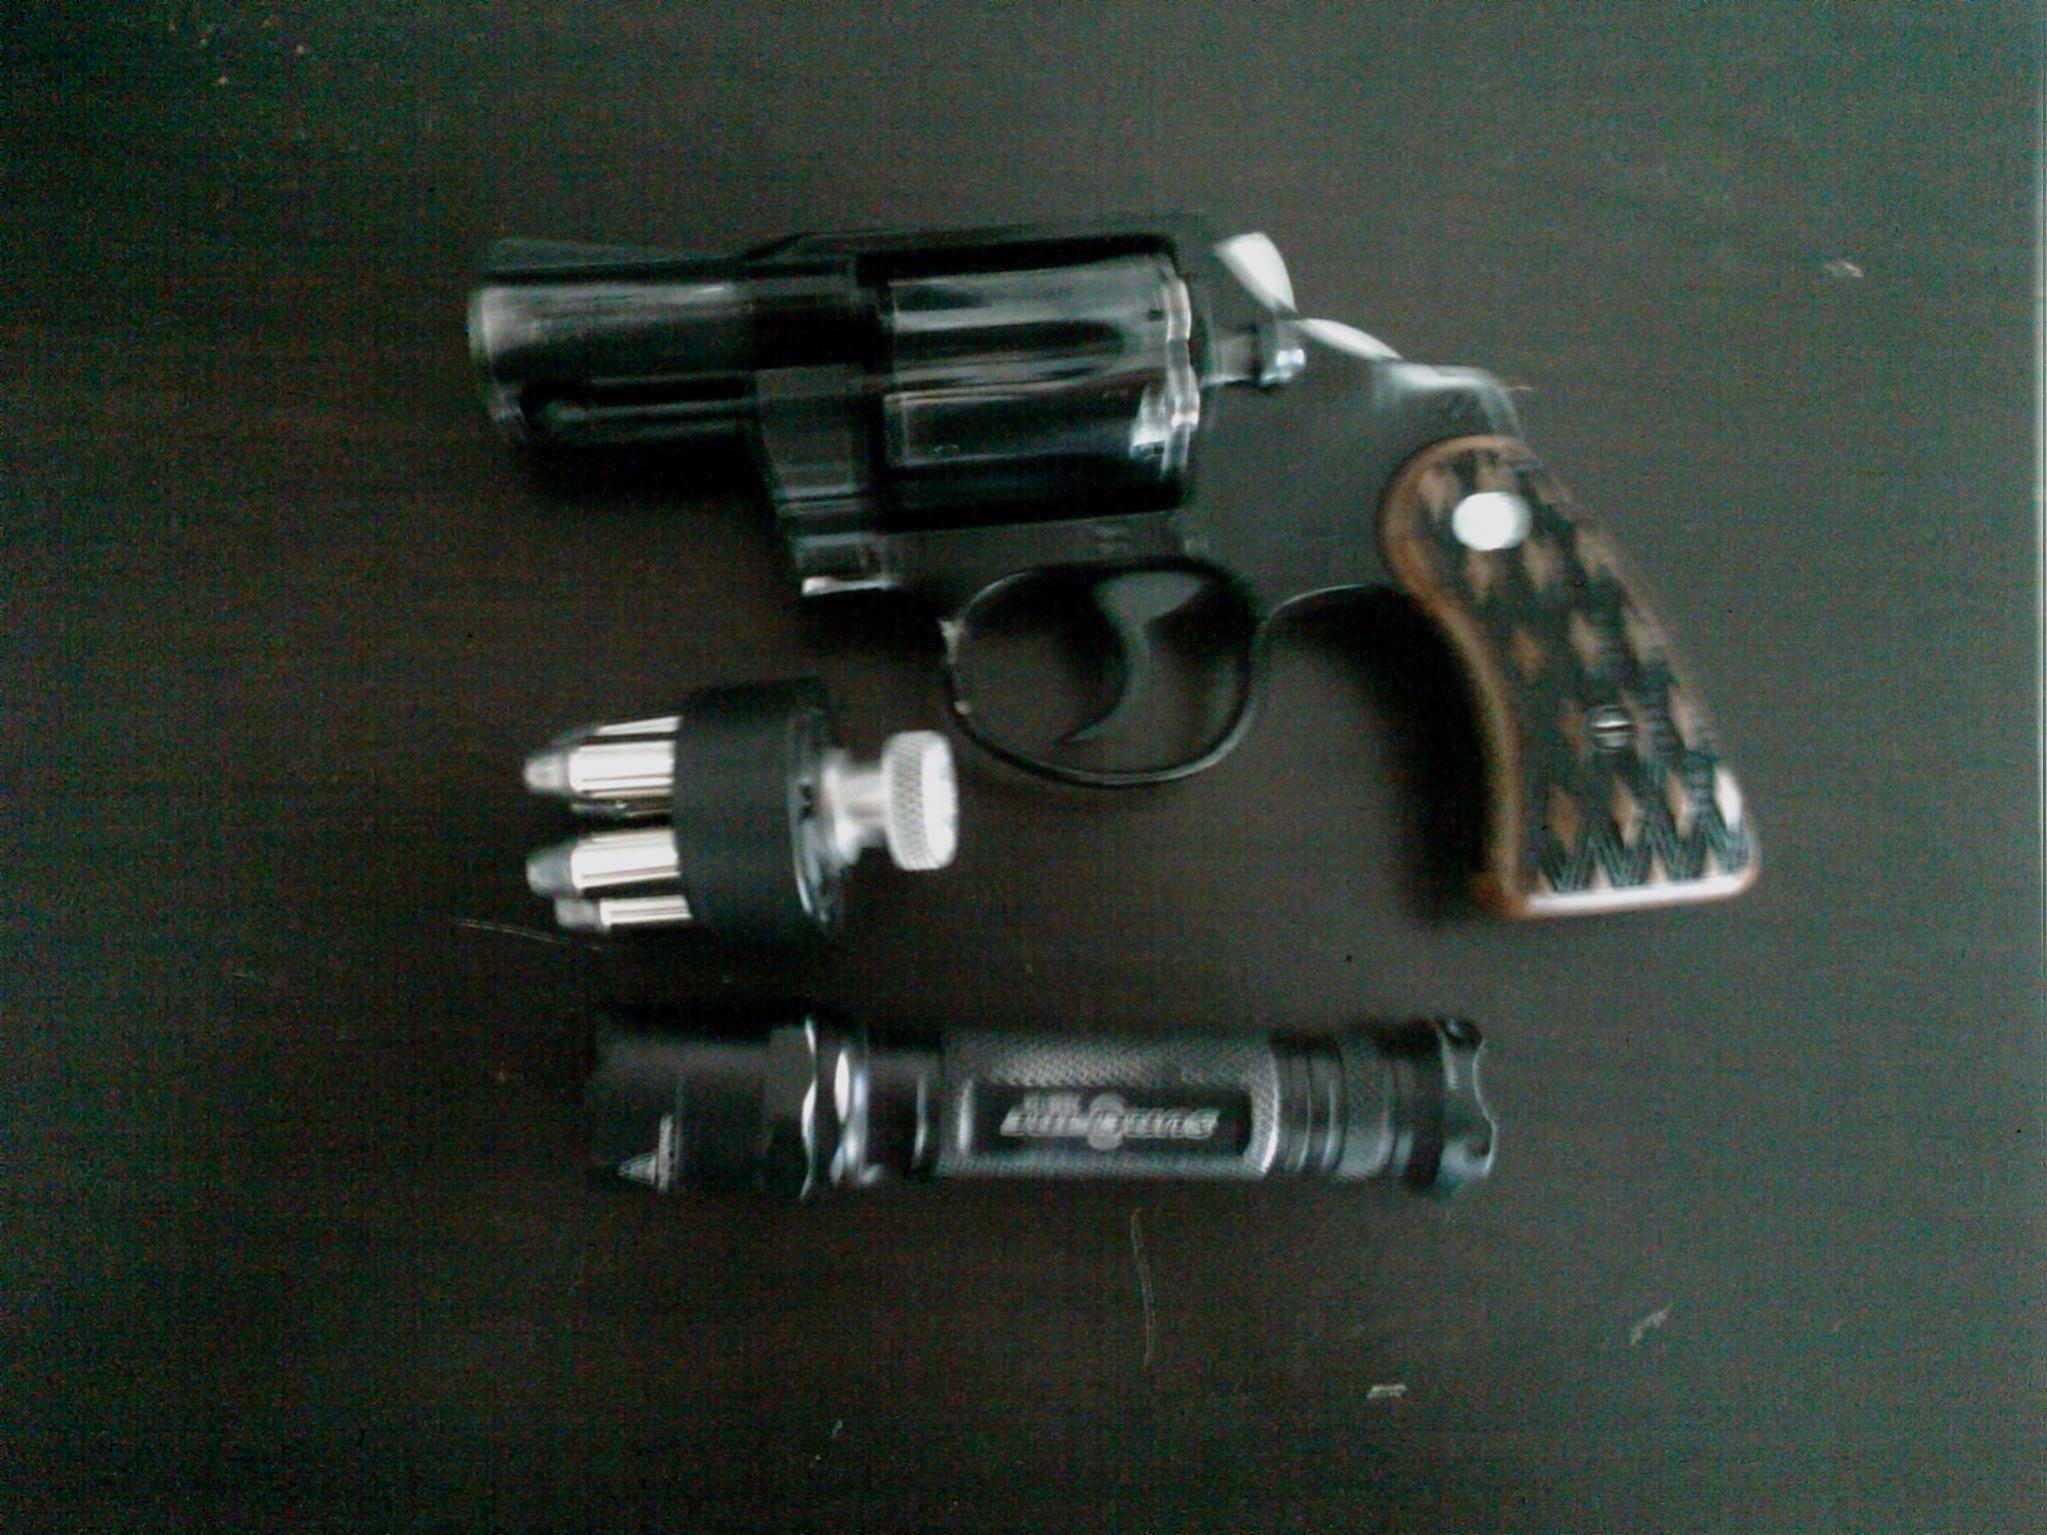 My Colt cobra with it's new tweak-imag0160.jpg